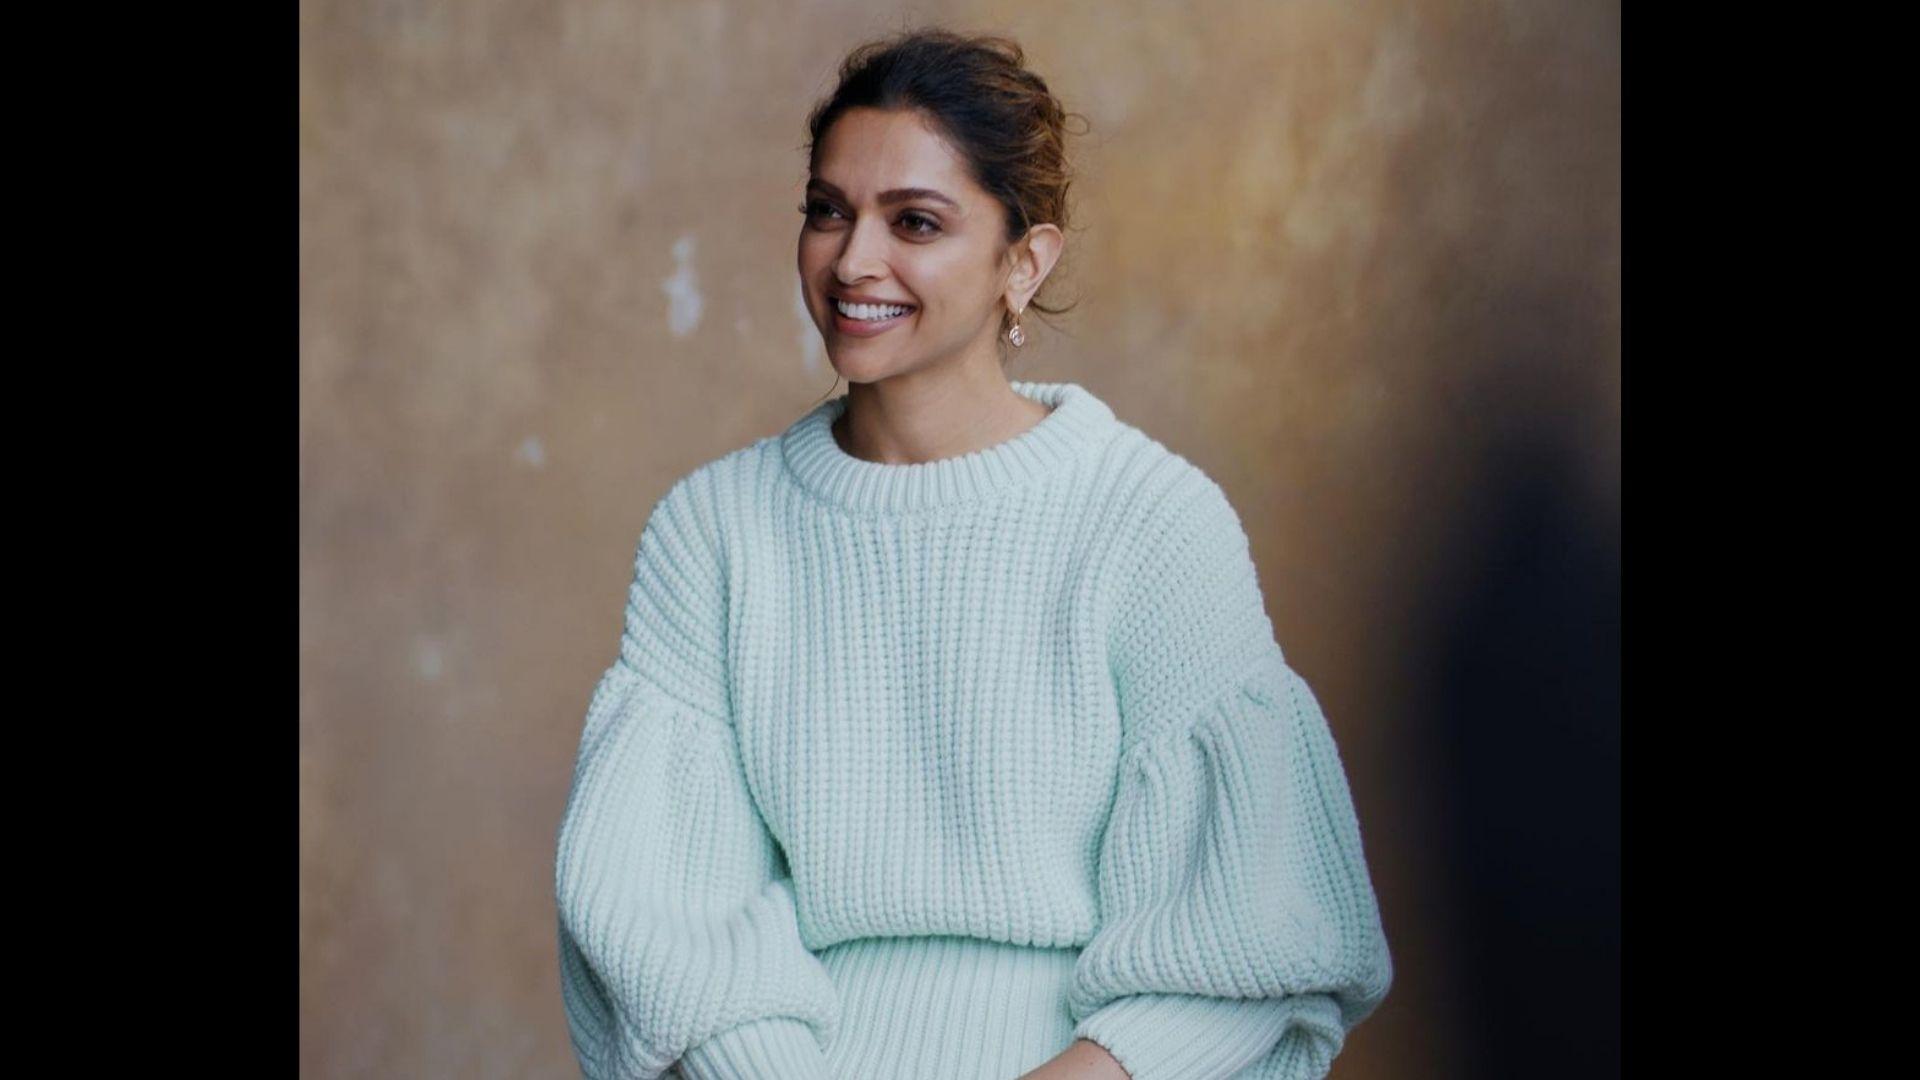 Deepika Padukone Dons An Easy Breezy Sweatshirt In Her Latest IG Post – SEE PICS